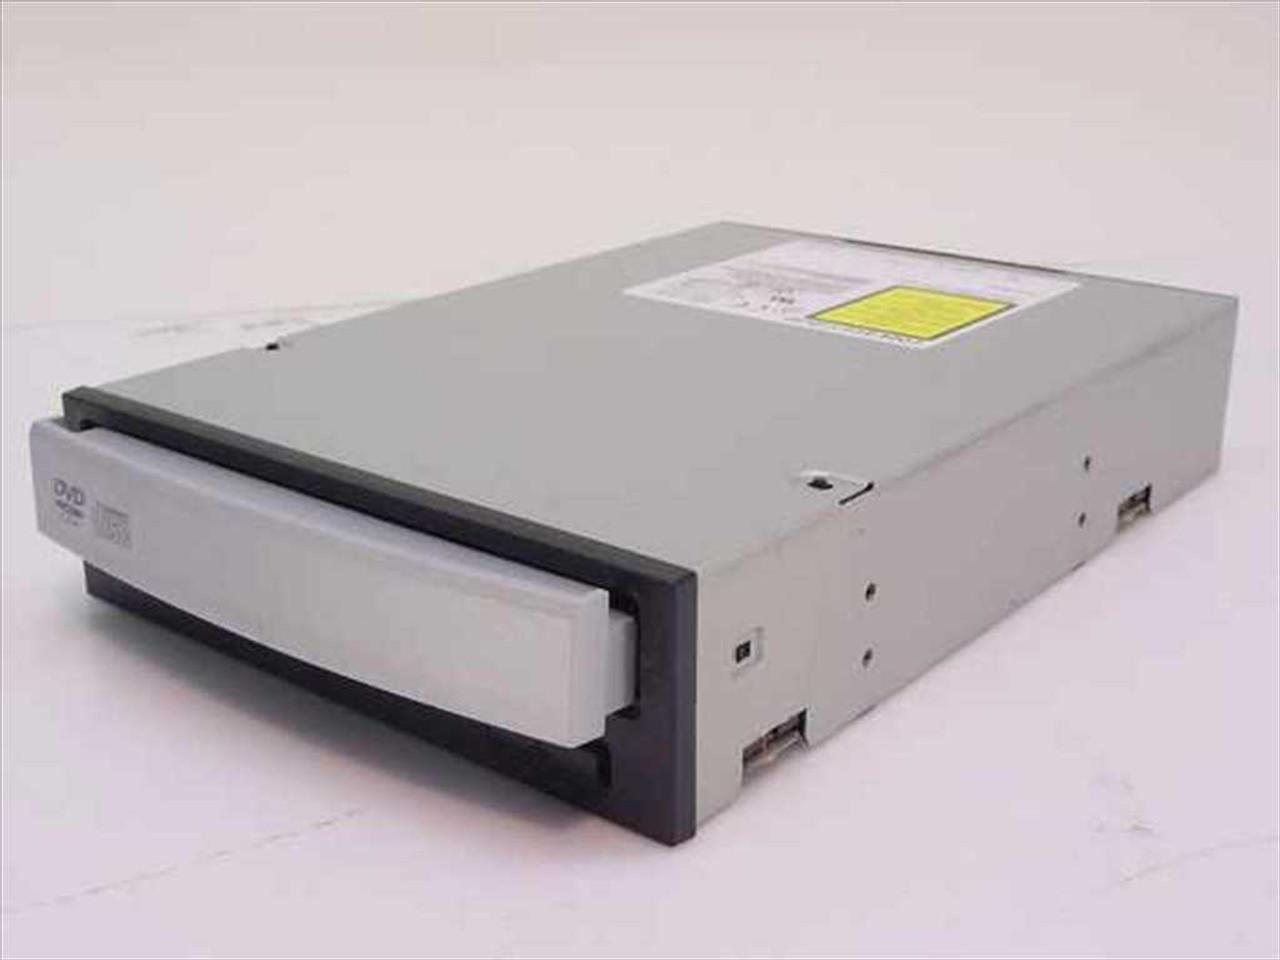 Sony crx830e